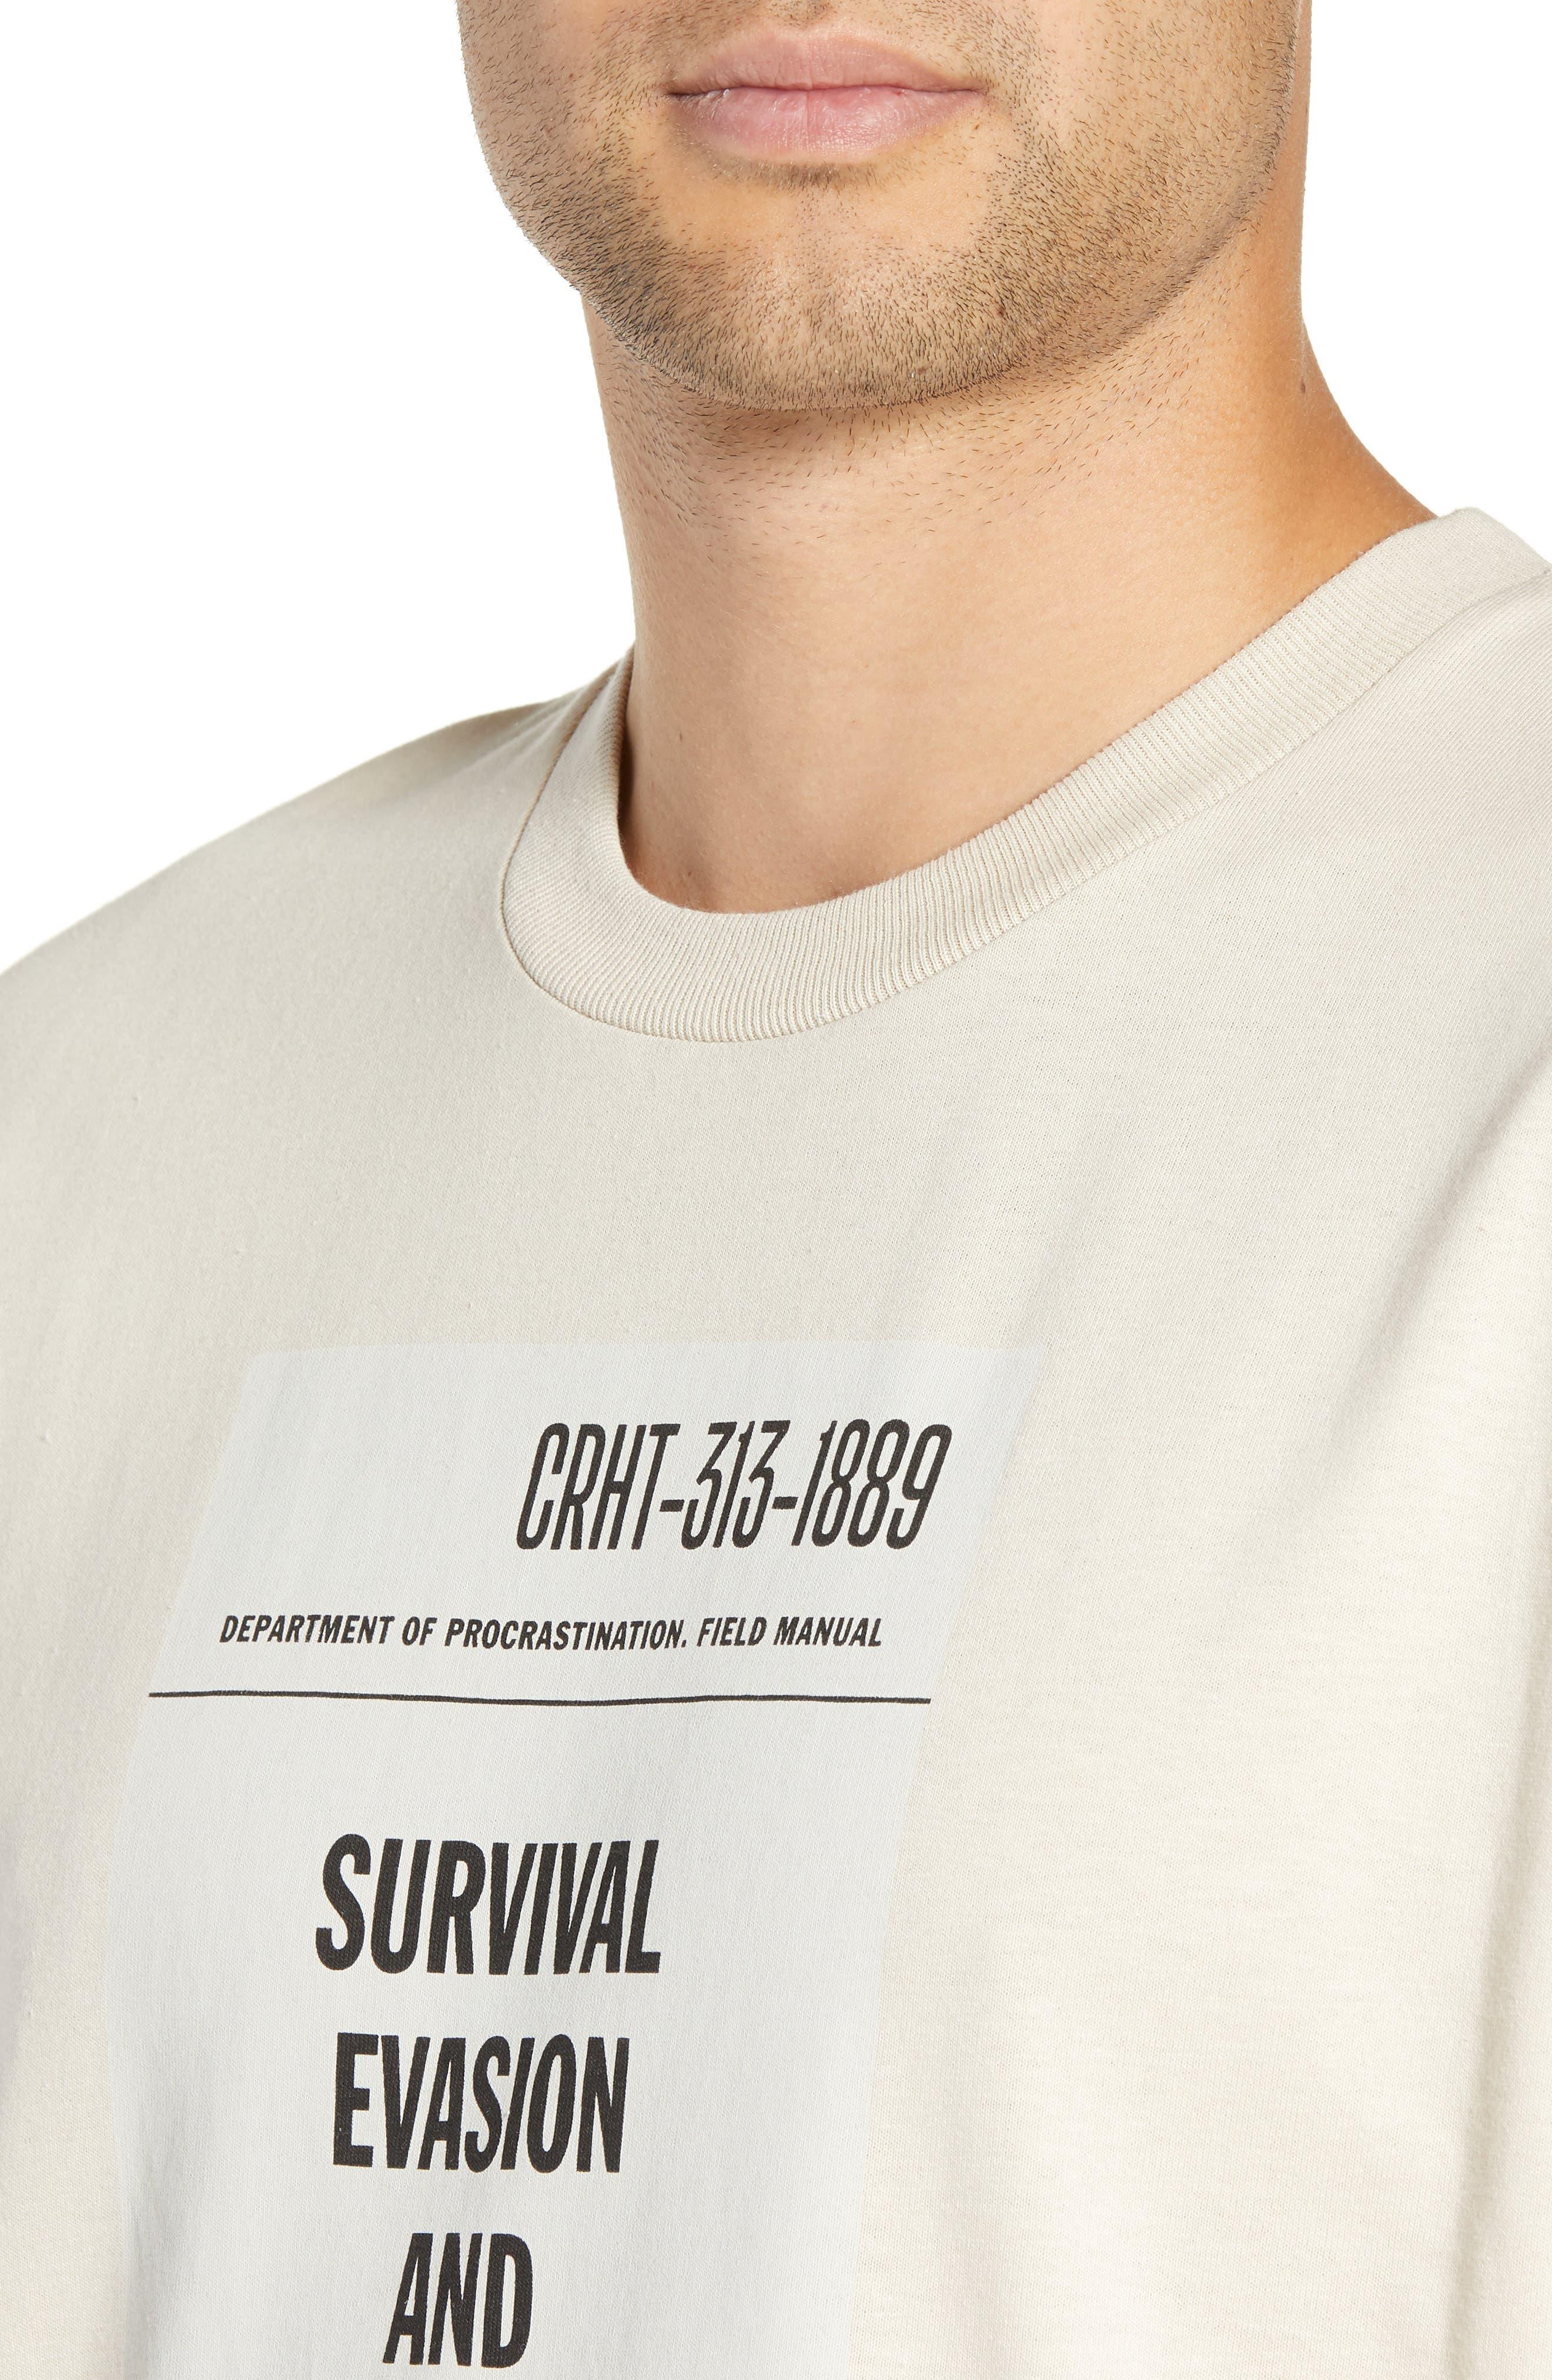 CARHARTT WORK IN PROGRESS,                             Survival Graphic T-Shirt,                             Alternate thumbnail 4, color,                             250